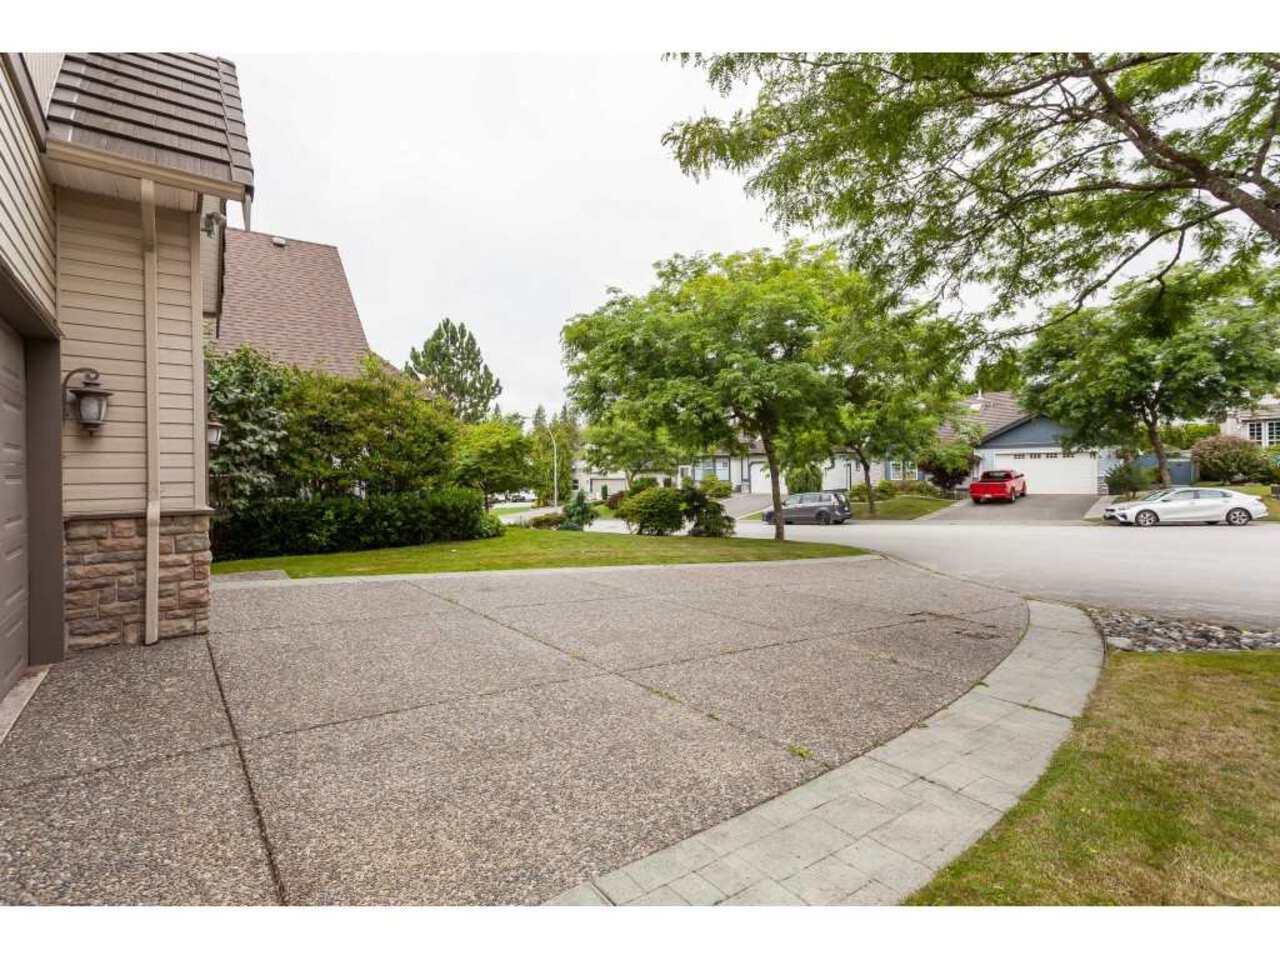 21058-85a-avenue-walnut-grove-langley-02 at 21058 85a Avenue, Walnut Grove, Langley